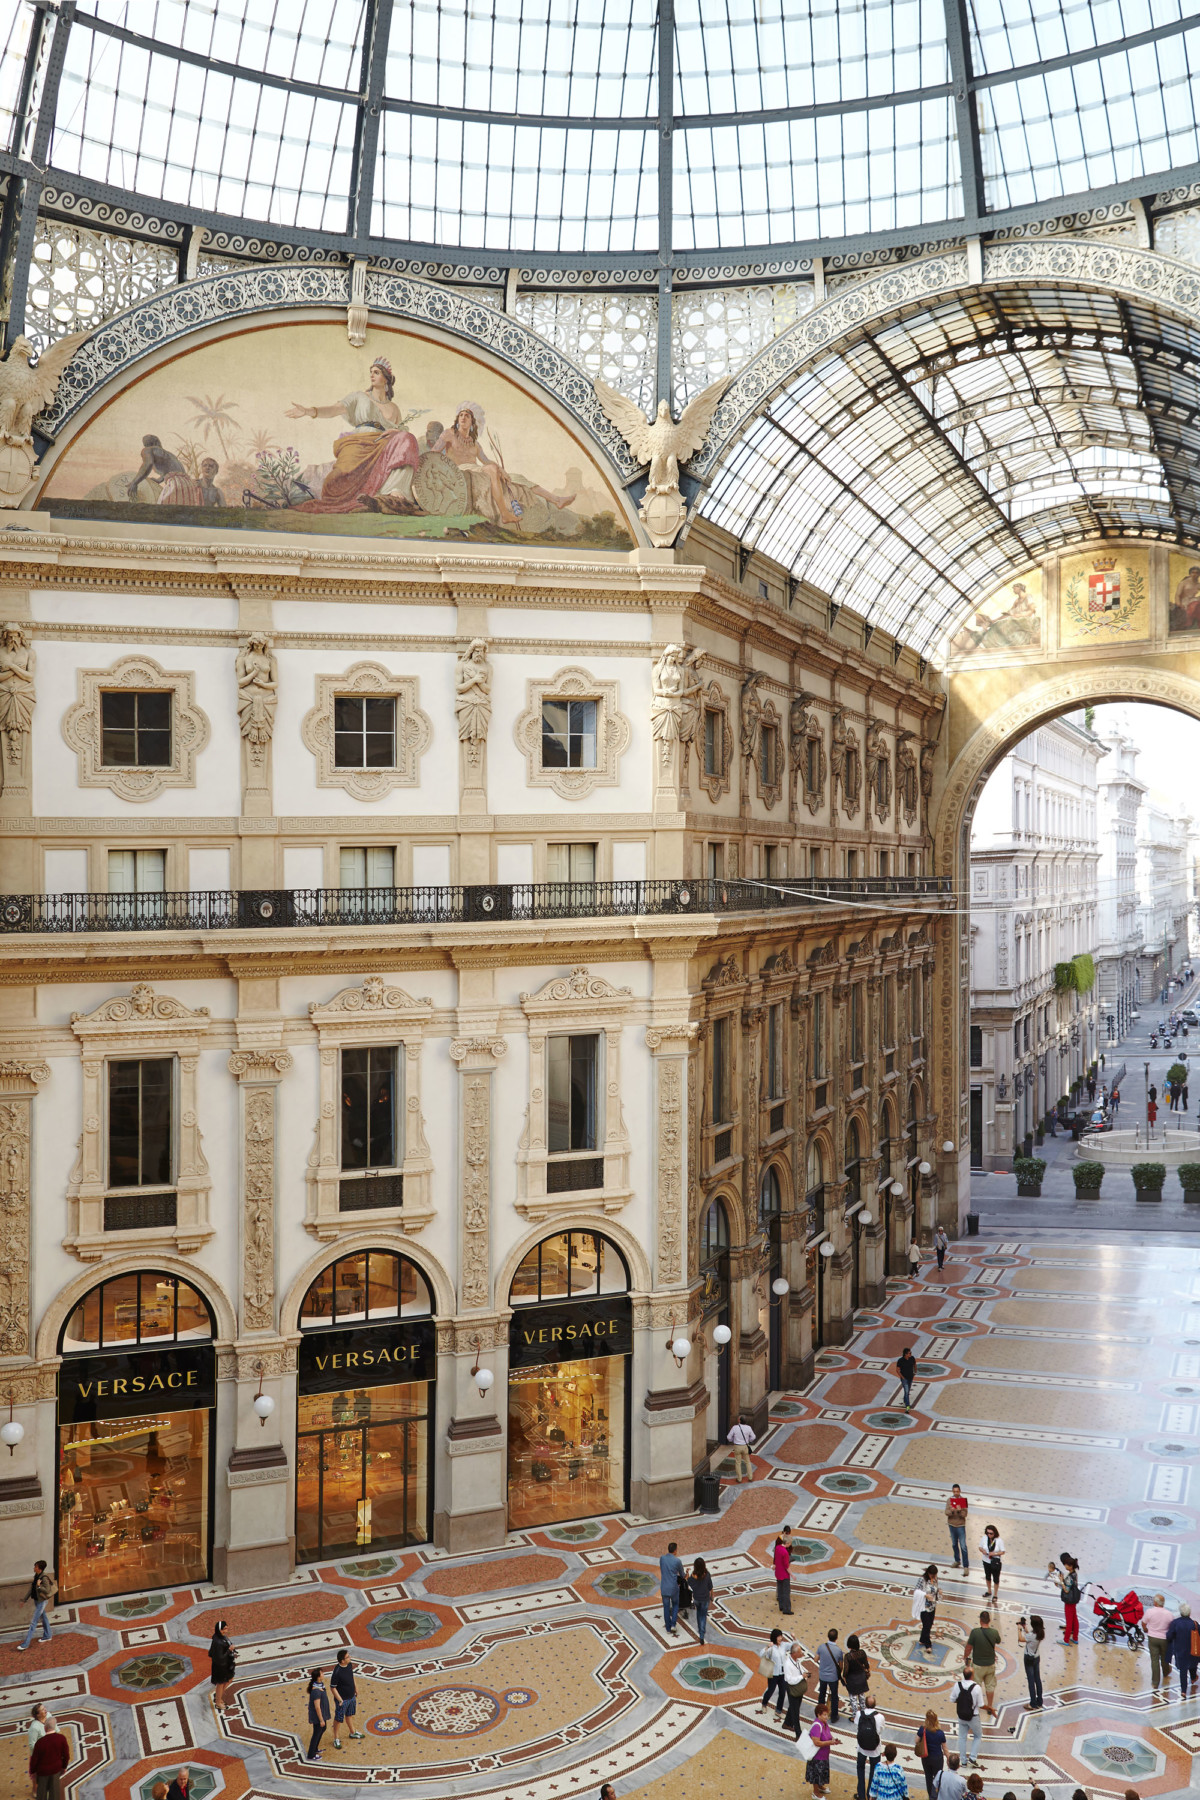 Jamie-Fobert-Architects Versace-Galleria-Vittorio-Emanuele-II-Milan-luxury-retail-heritage-arcade